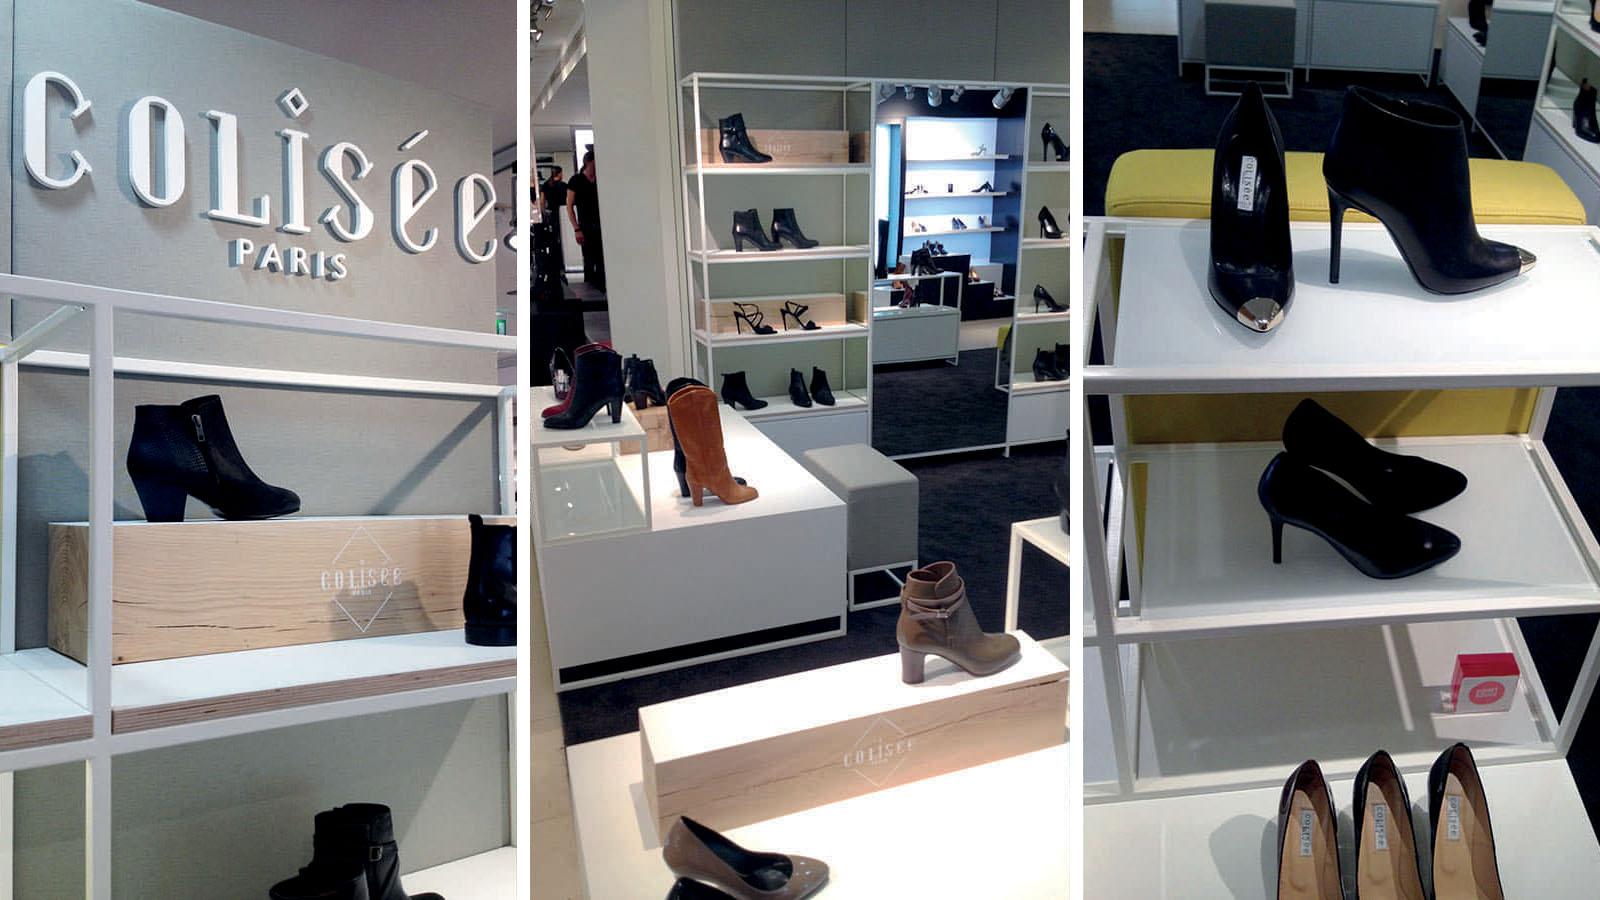 EFI Design Boutique Colisee Paris Efi Design 2 931